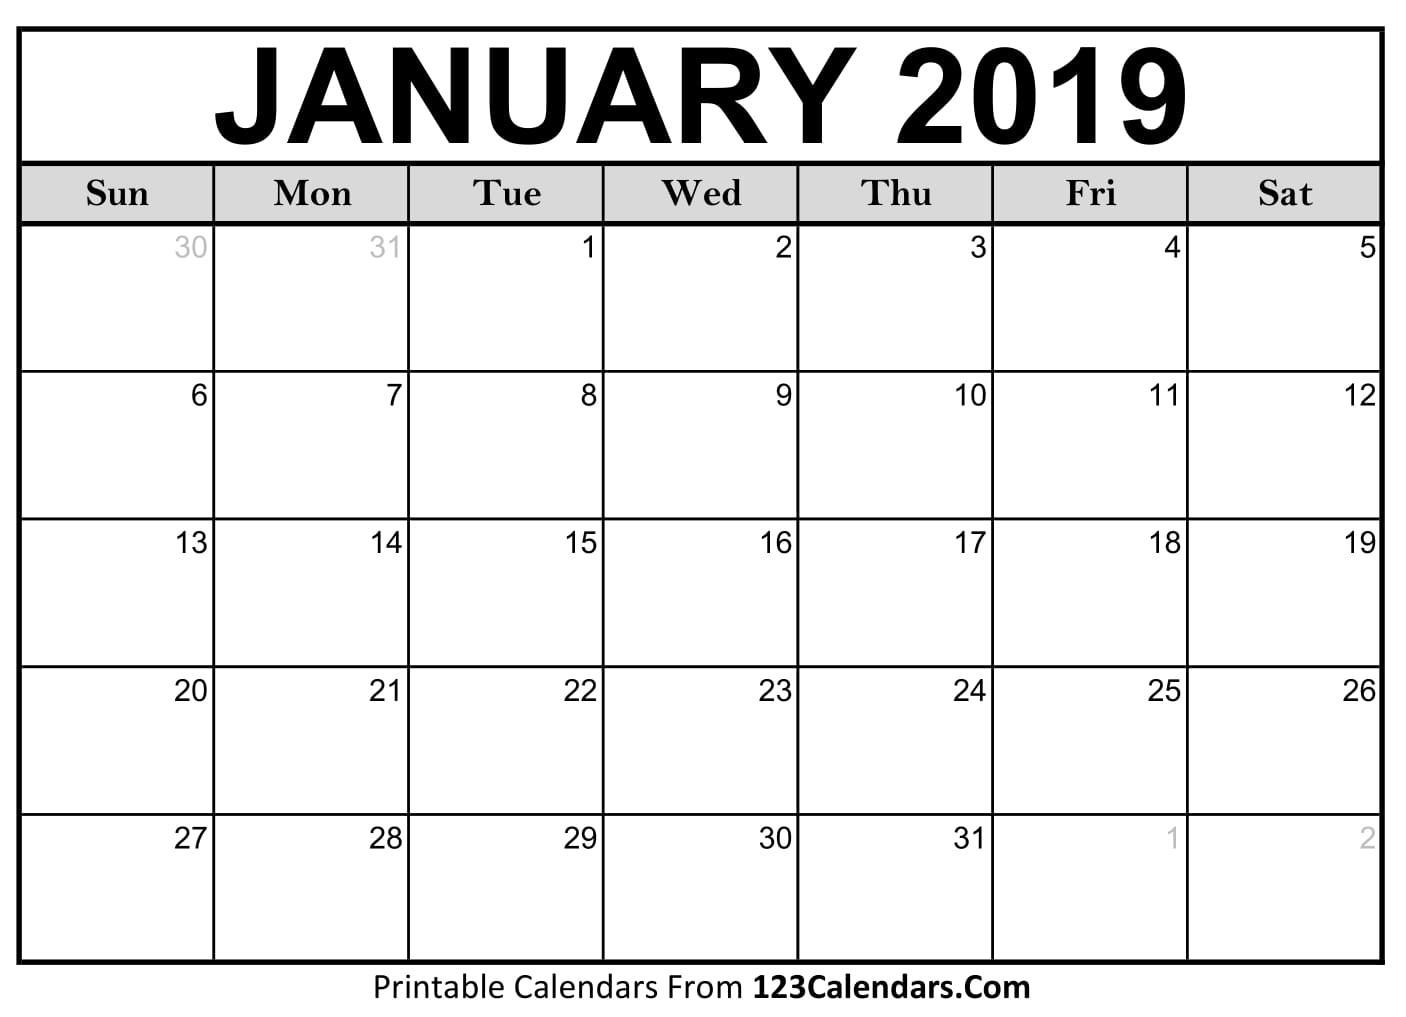 Free Printable Calendar | 123Calendars-Template Of 2020 August Thru Dec Calendar